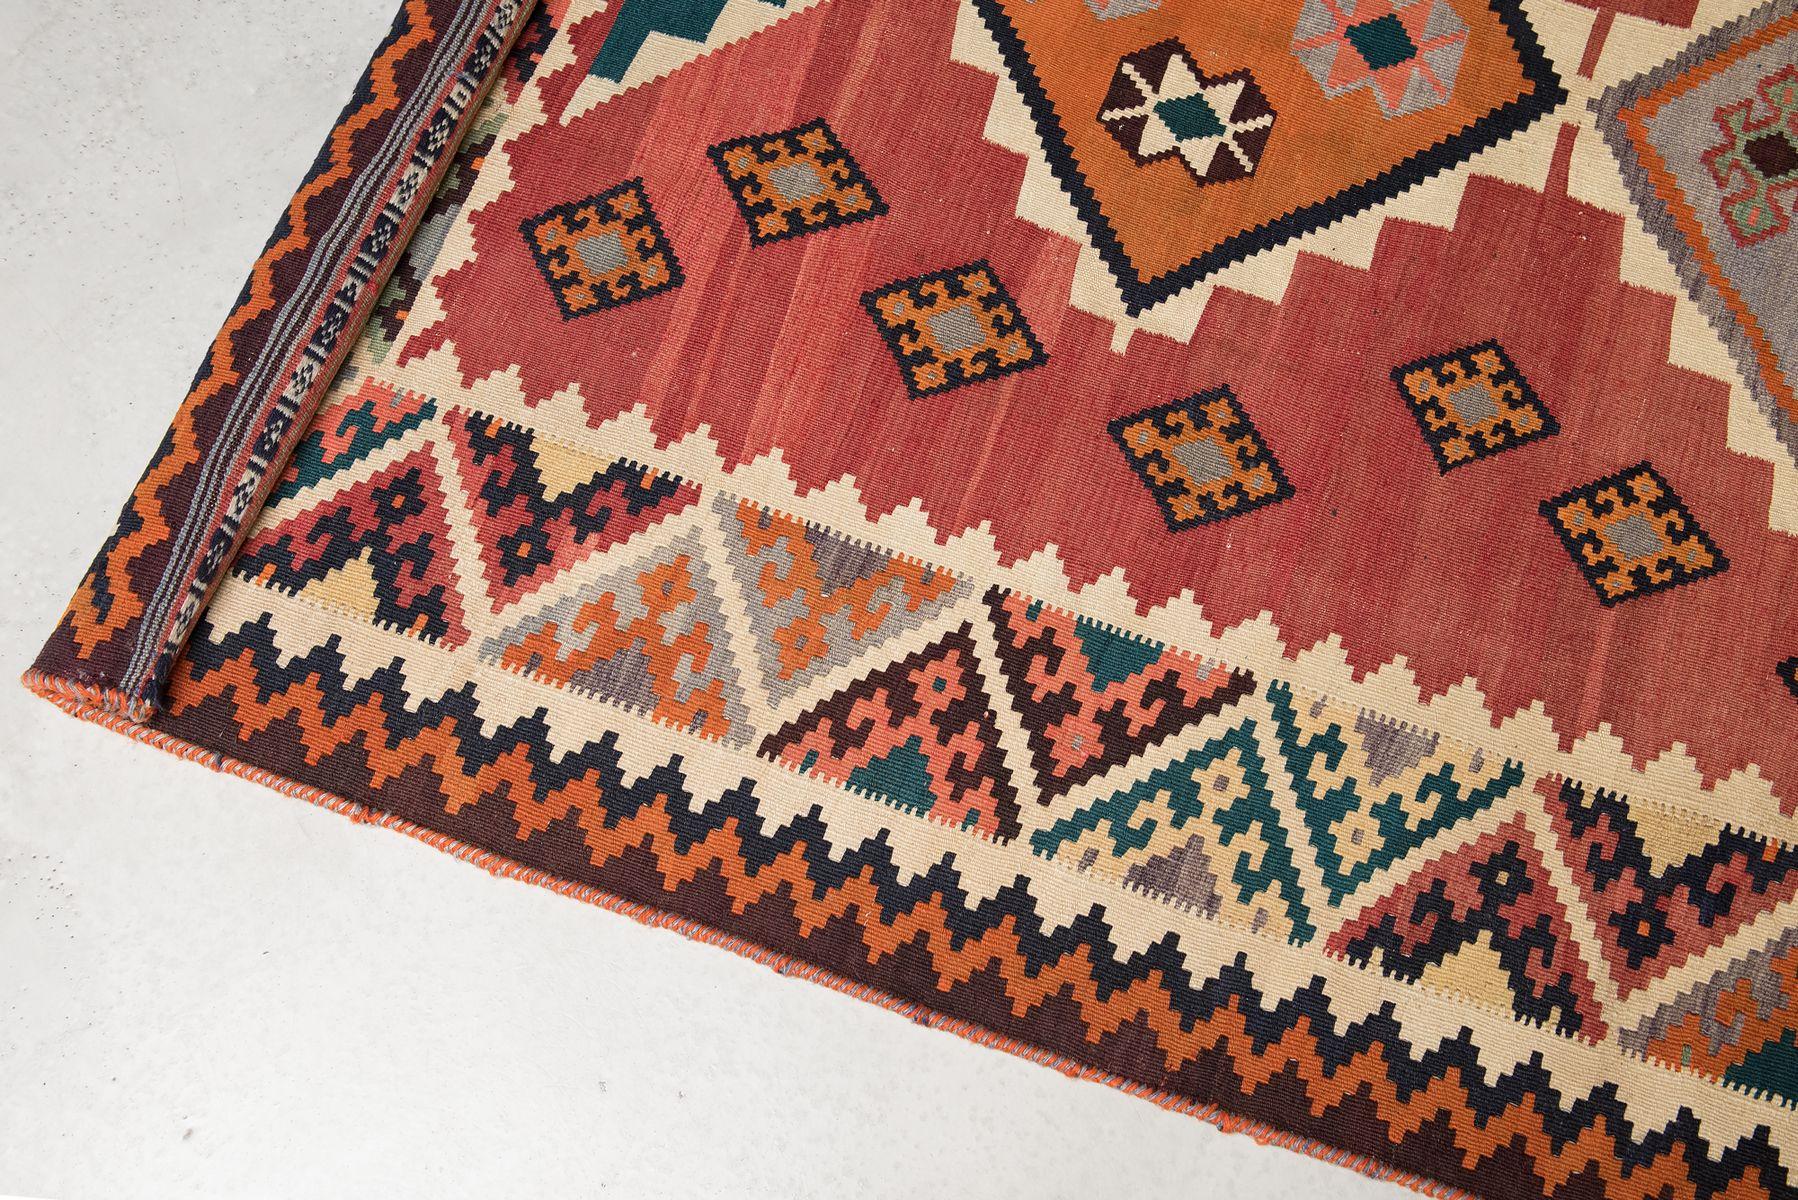 vintage kilim levant teppich 1960er bei pamono kaufen. Black Bedroom Furniture Sets. Home Design Ideas